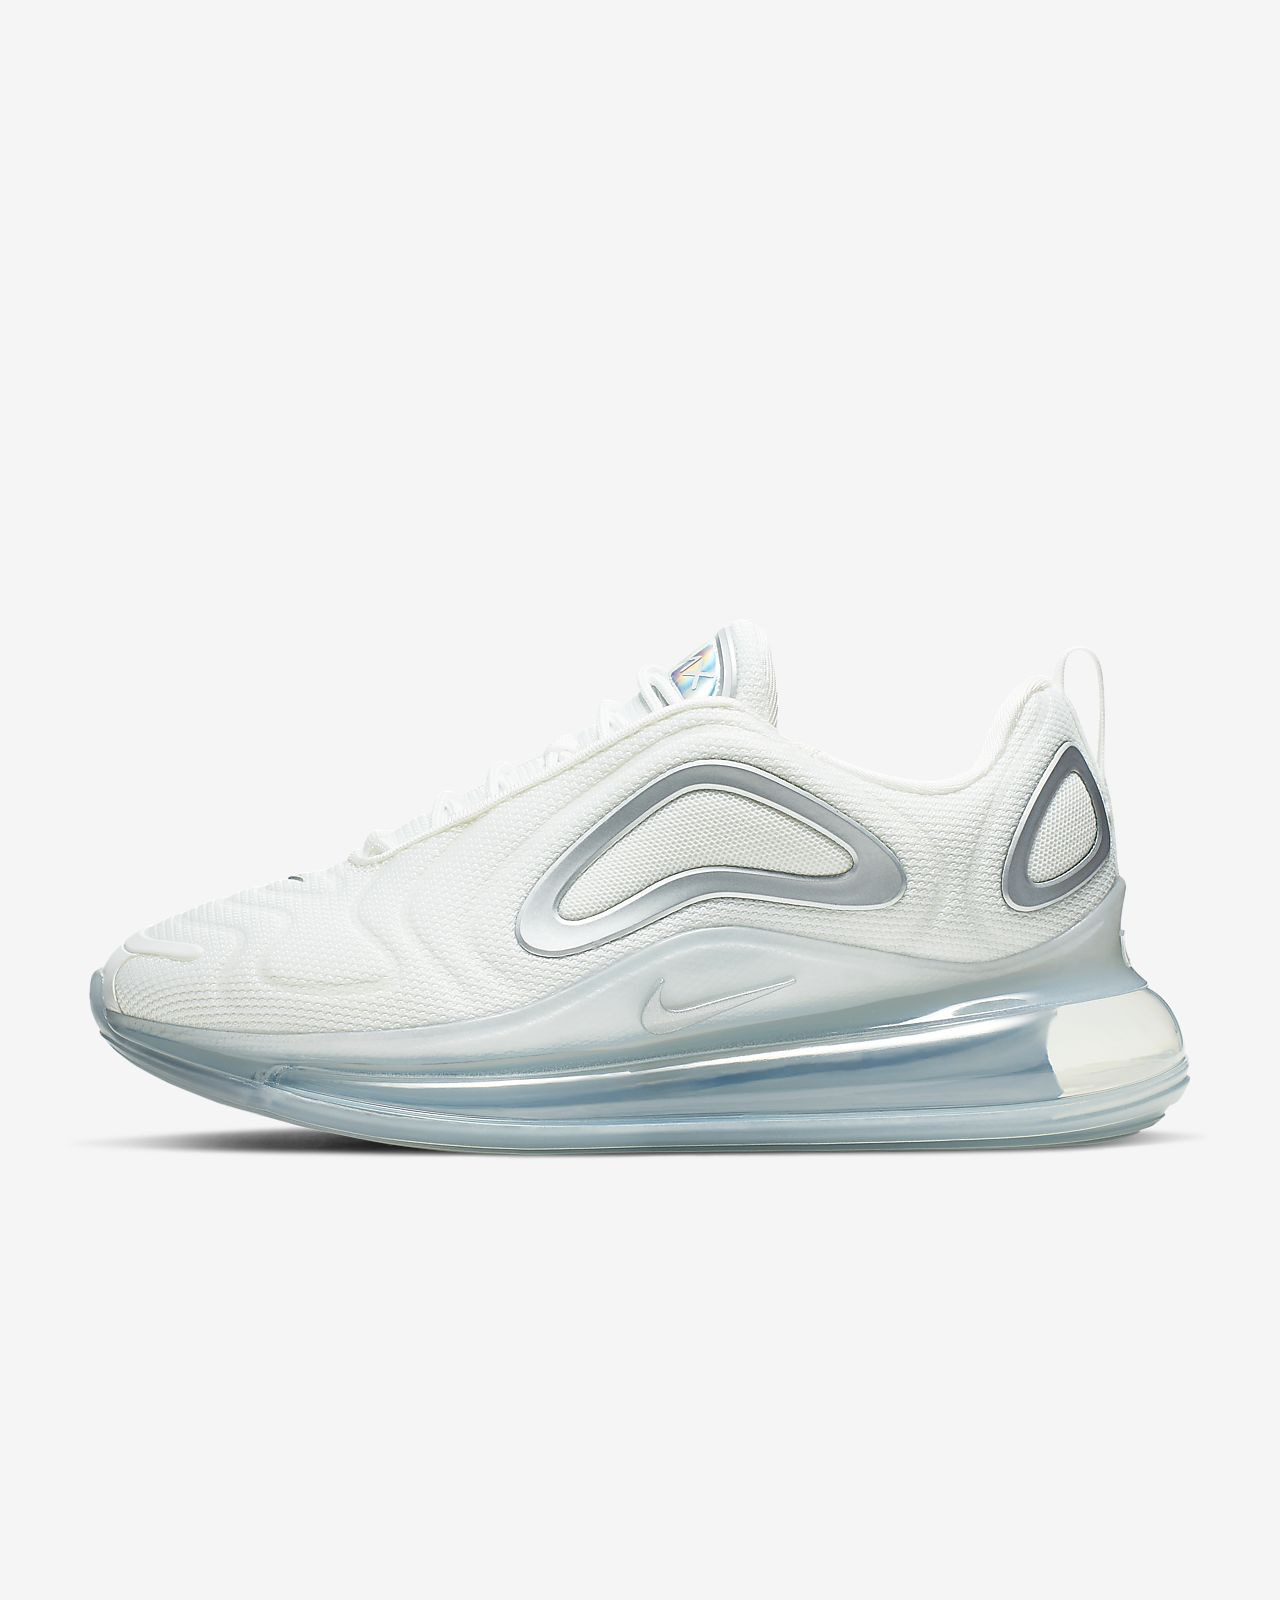 Nike Air Max 720 schimmernder Damenschuh